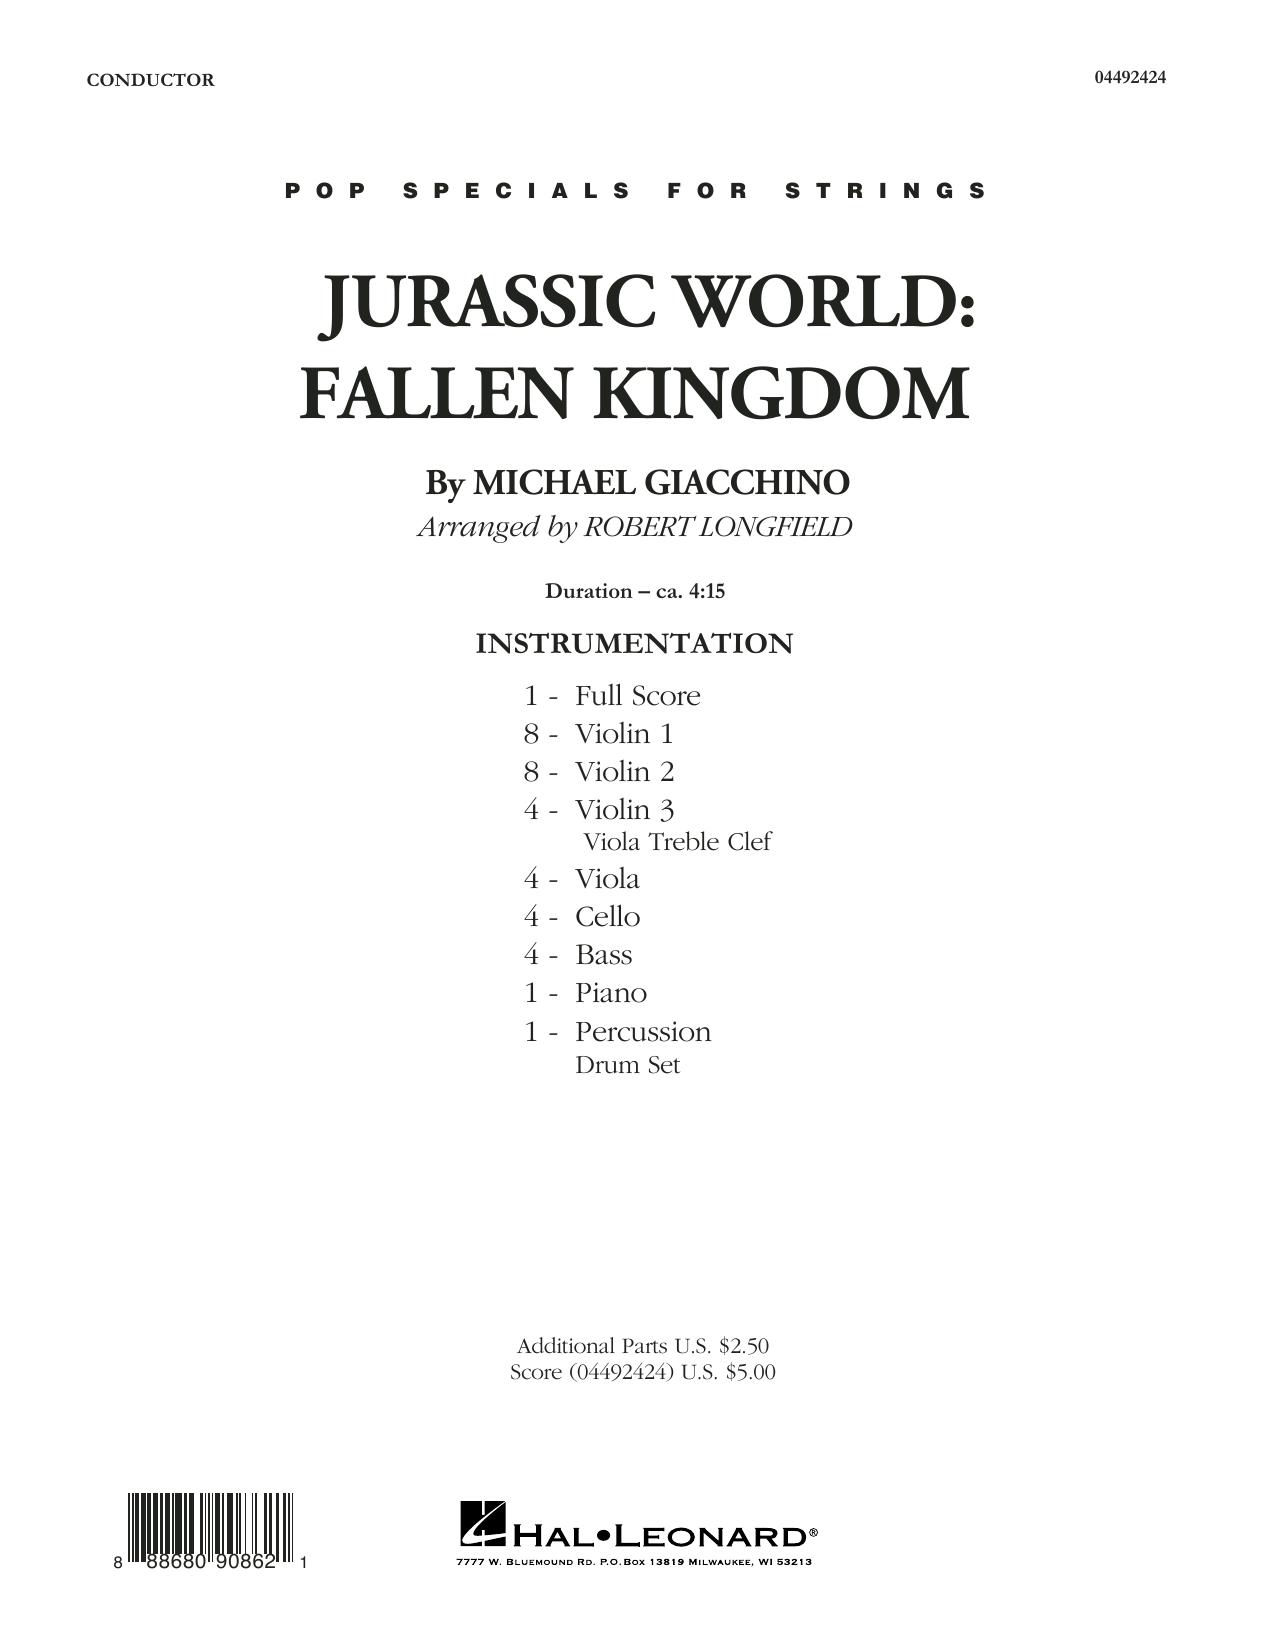 Jurassic World: Fallen Kingdom (arr. Robert Longfield) - Conductor Score (Full Score) (Orchestra)